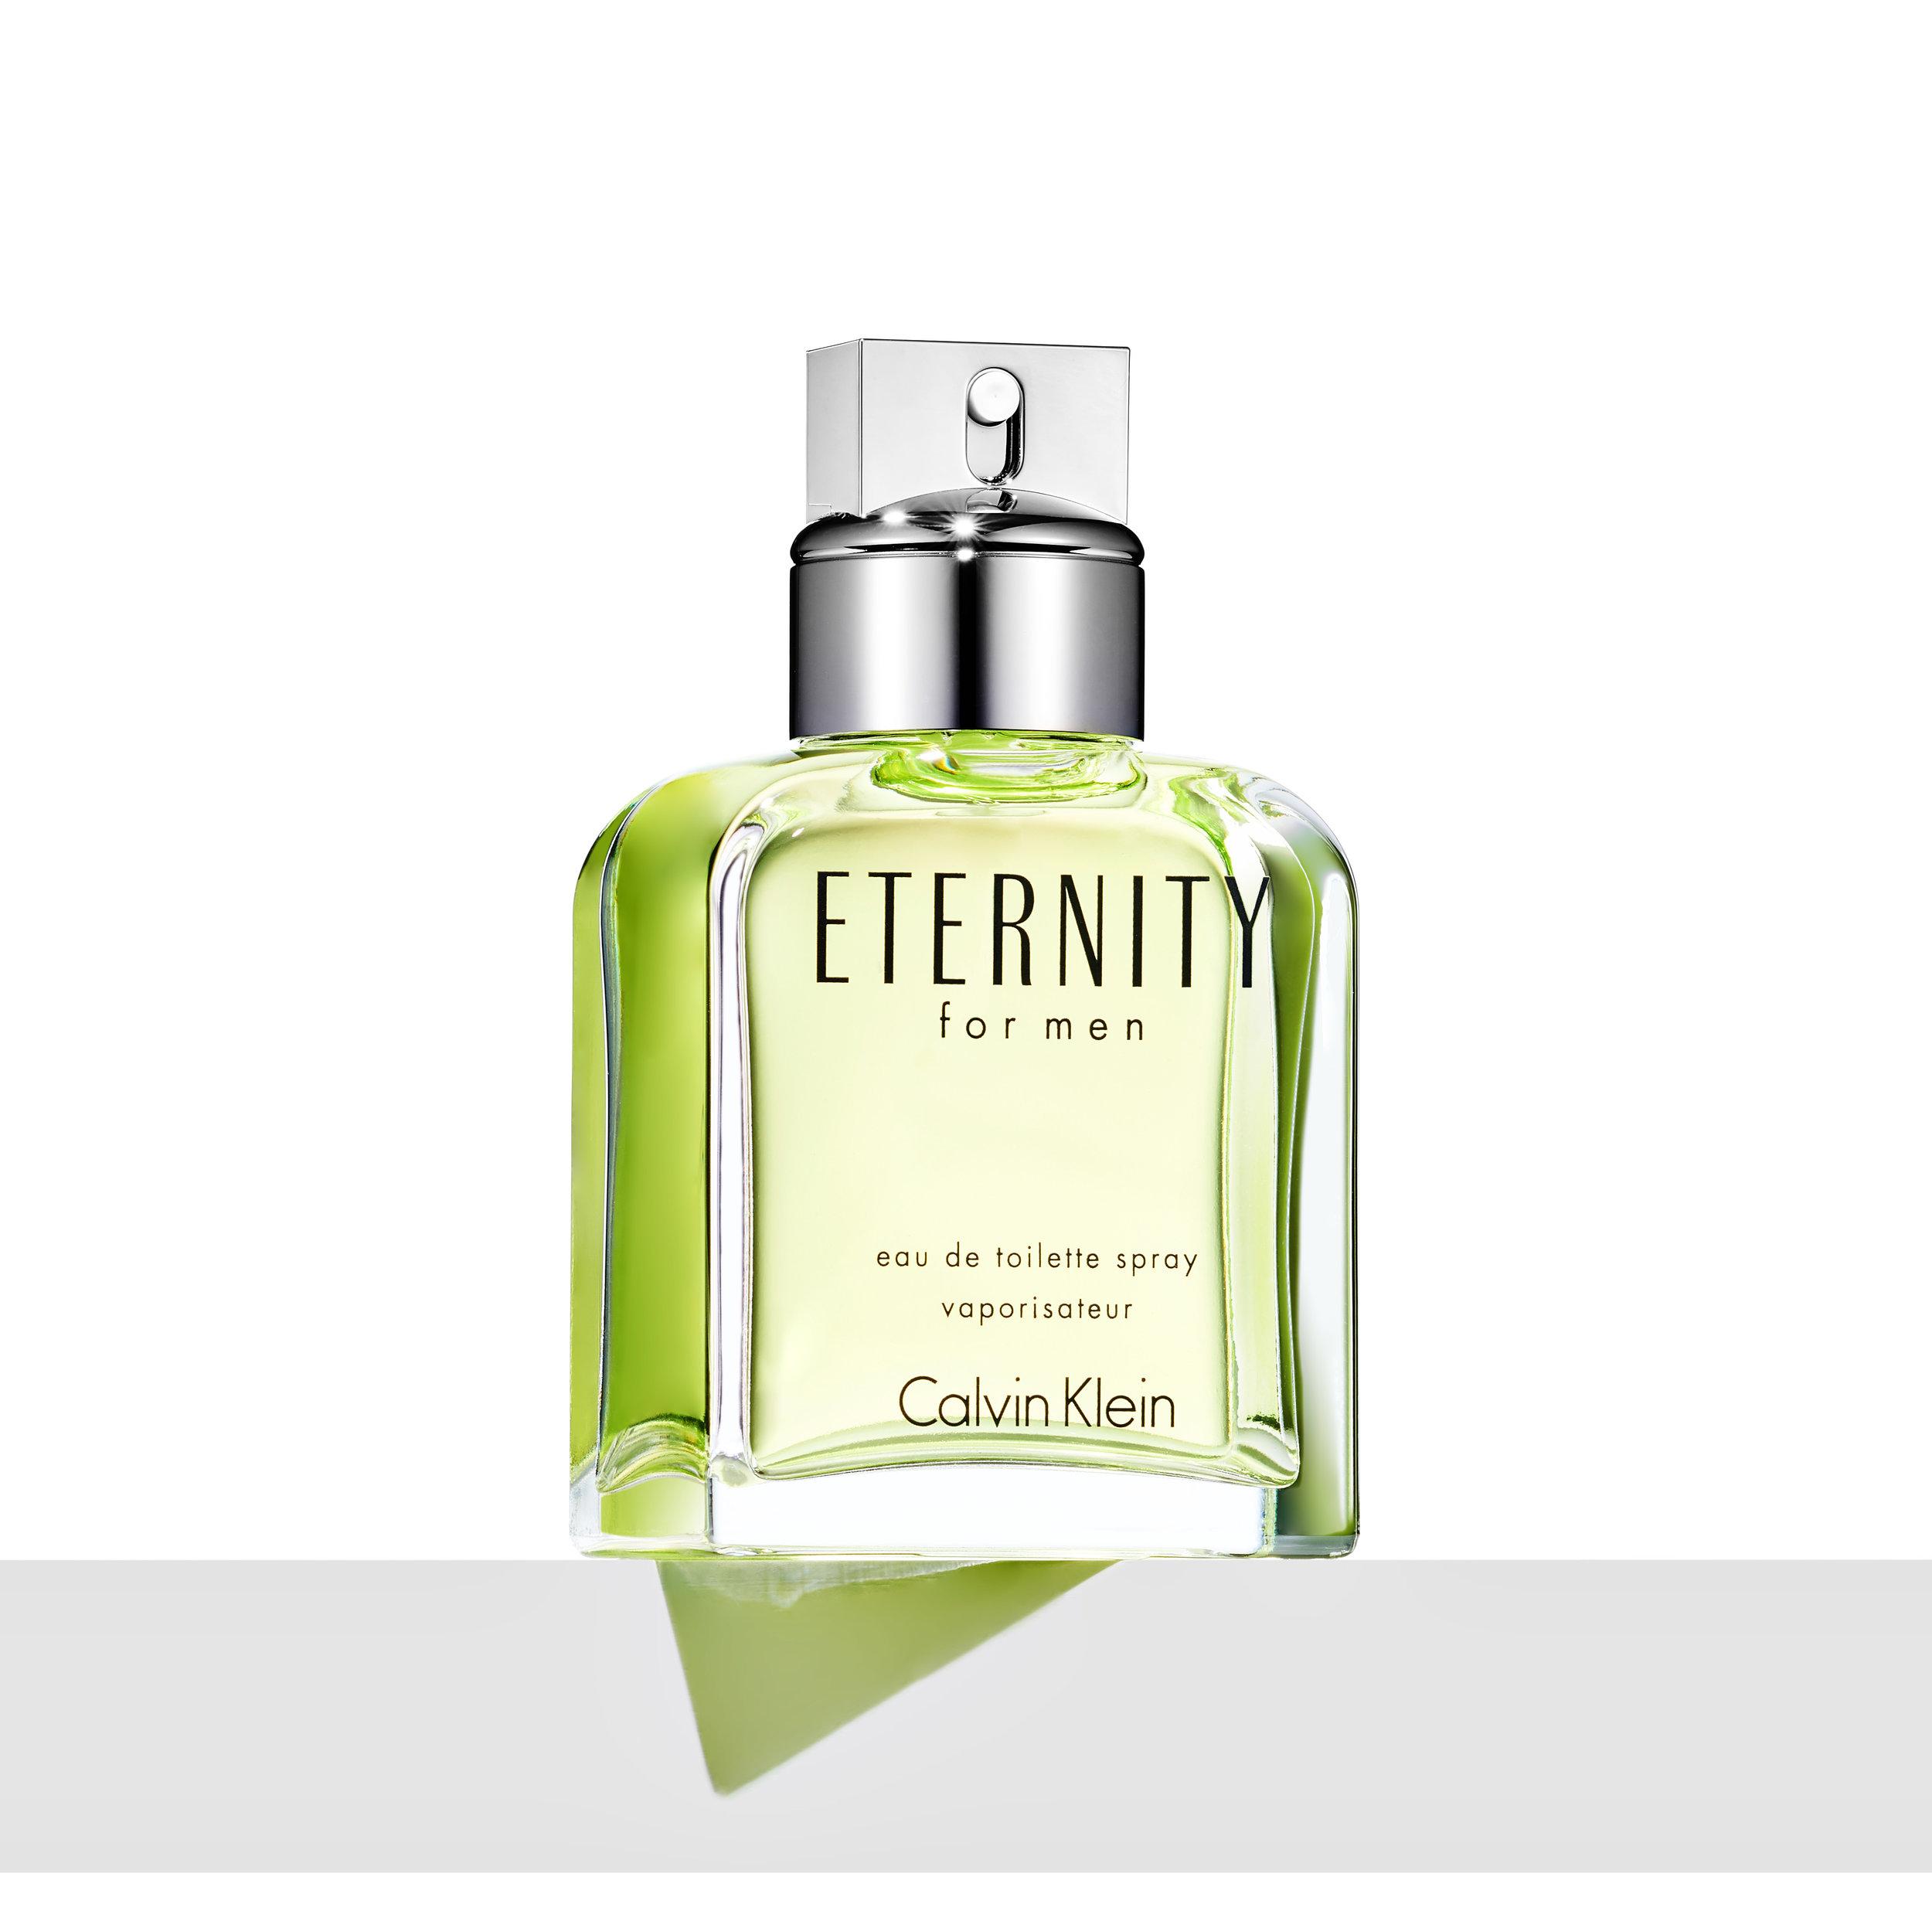 cosmeticshelf_CKeternity.jpg